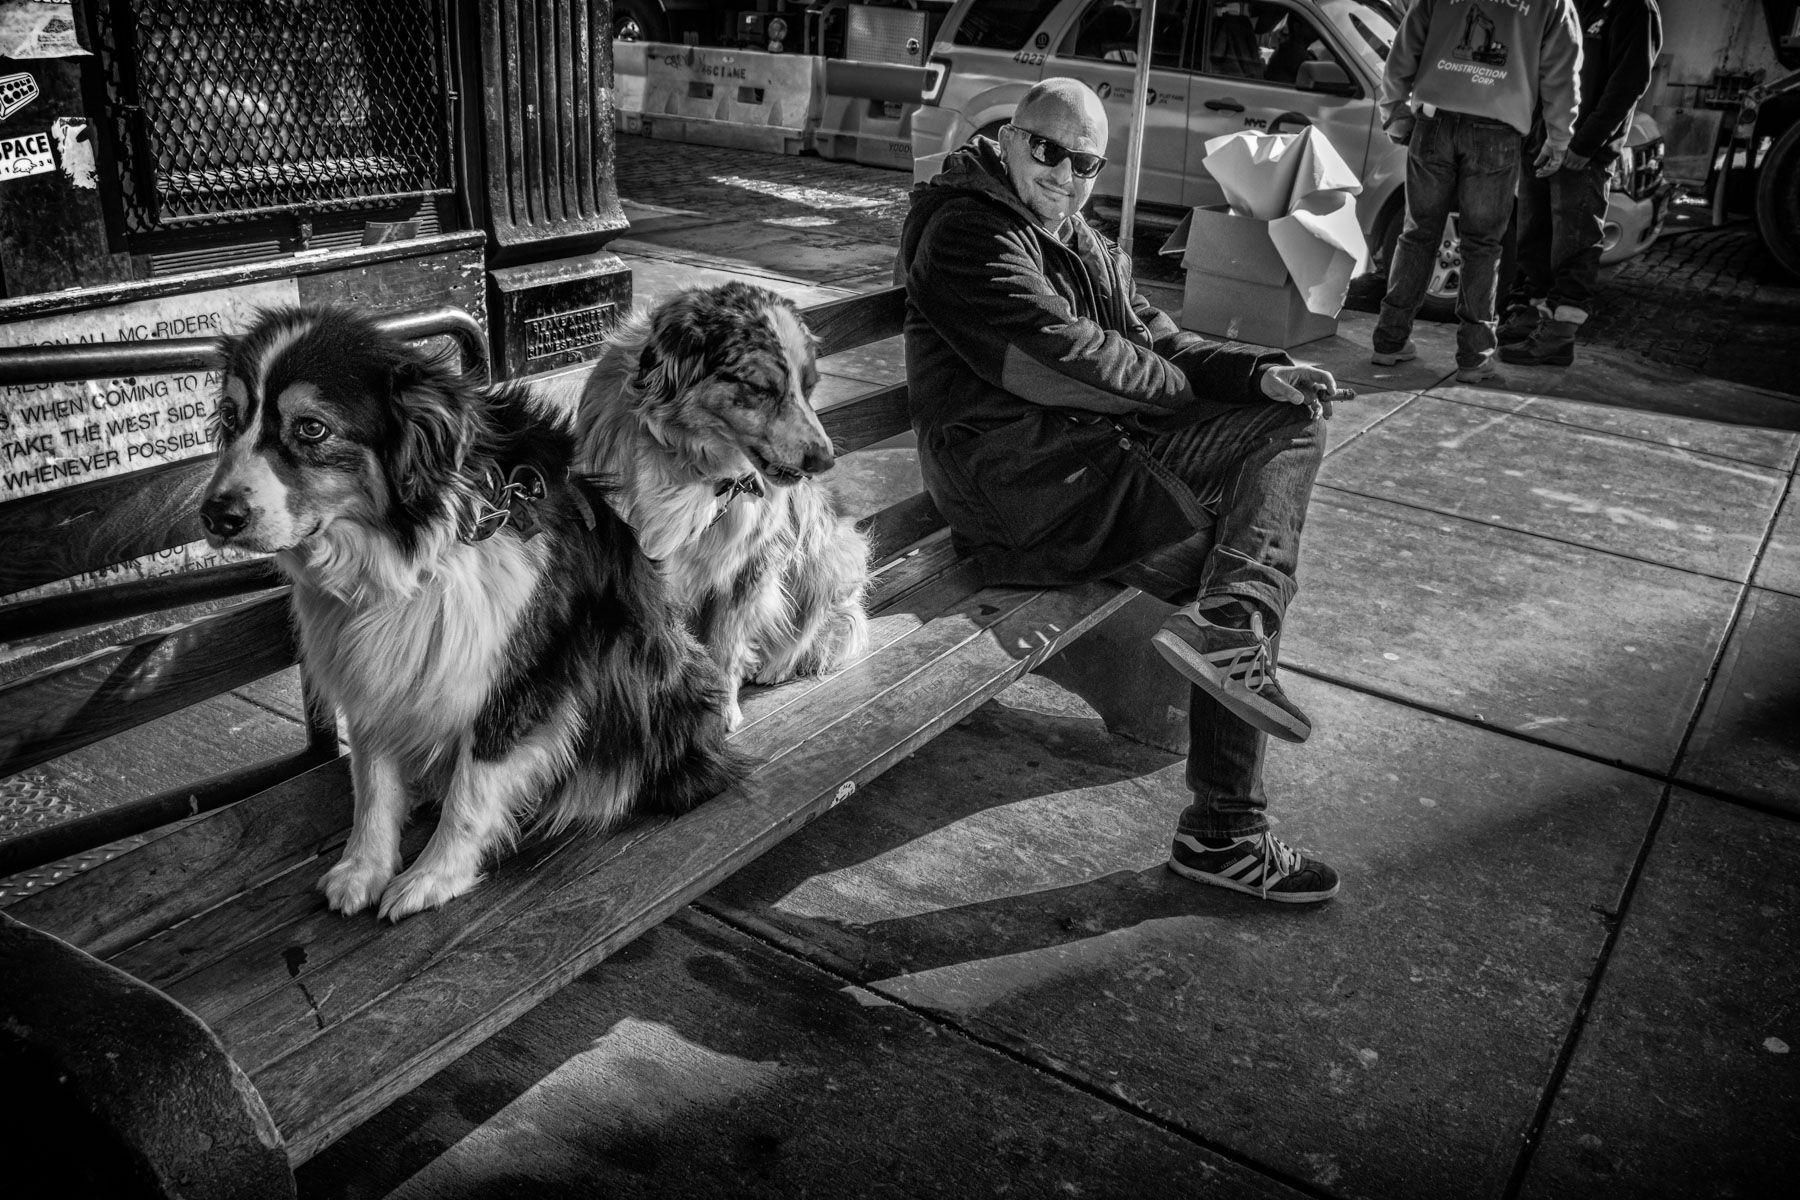 Manhattan, New York  03/09/13